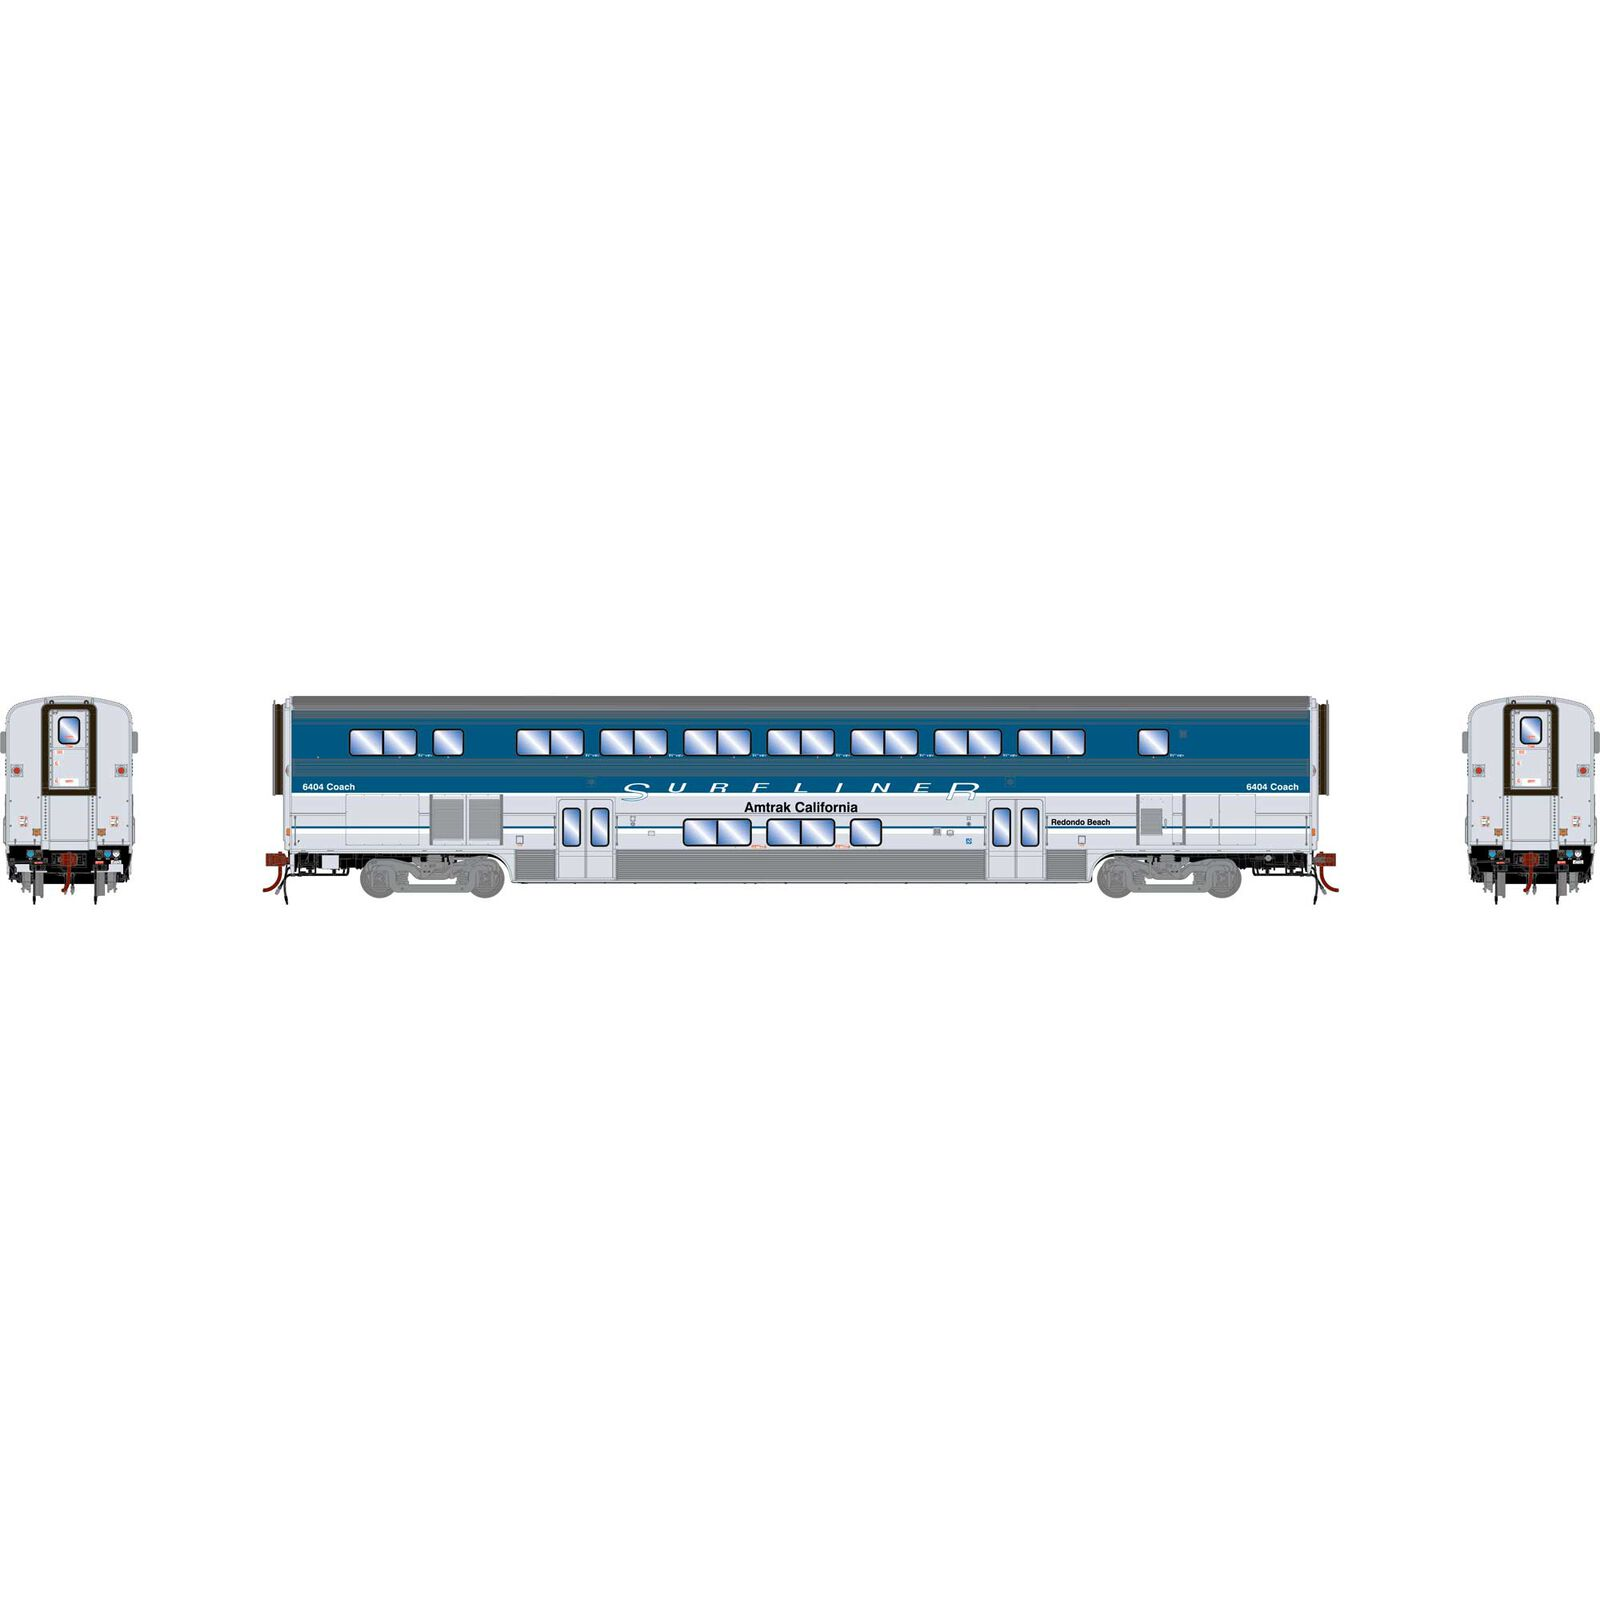 HO Surfliner Coach with Lights & Sound, Amtrak #6404